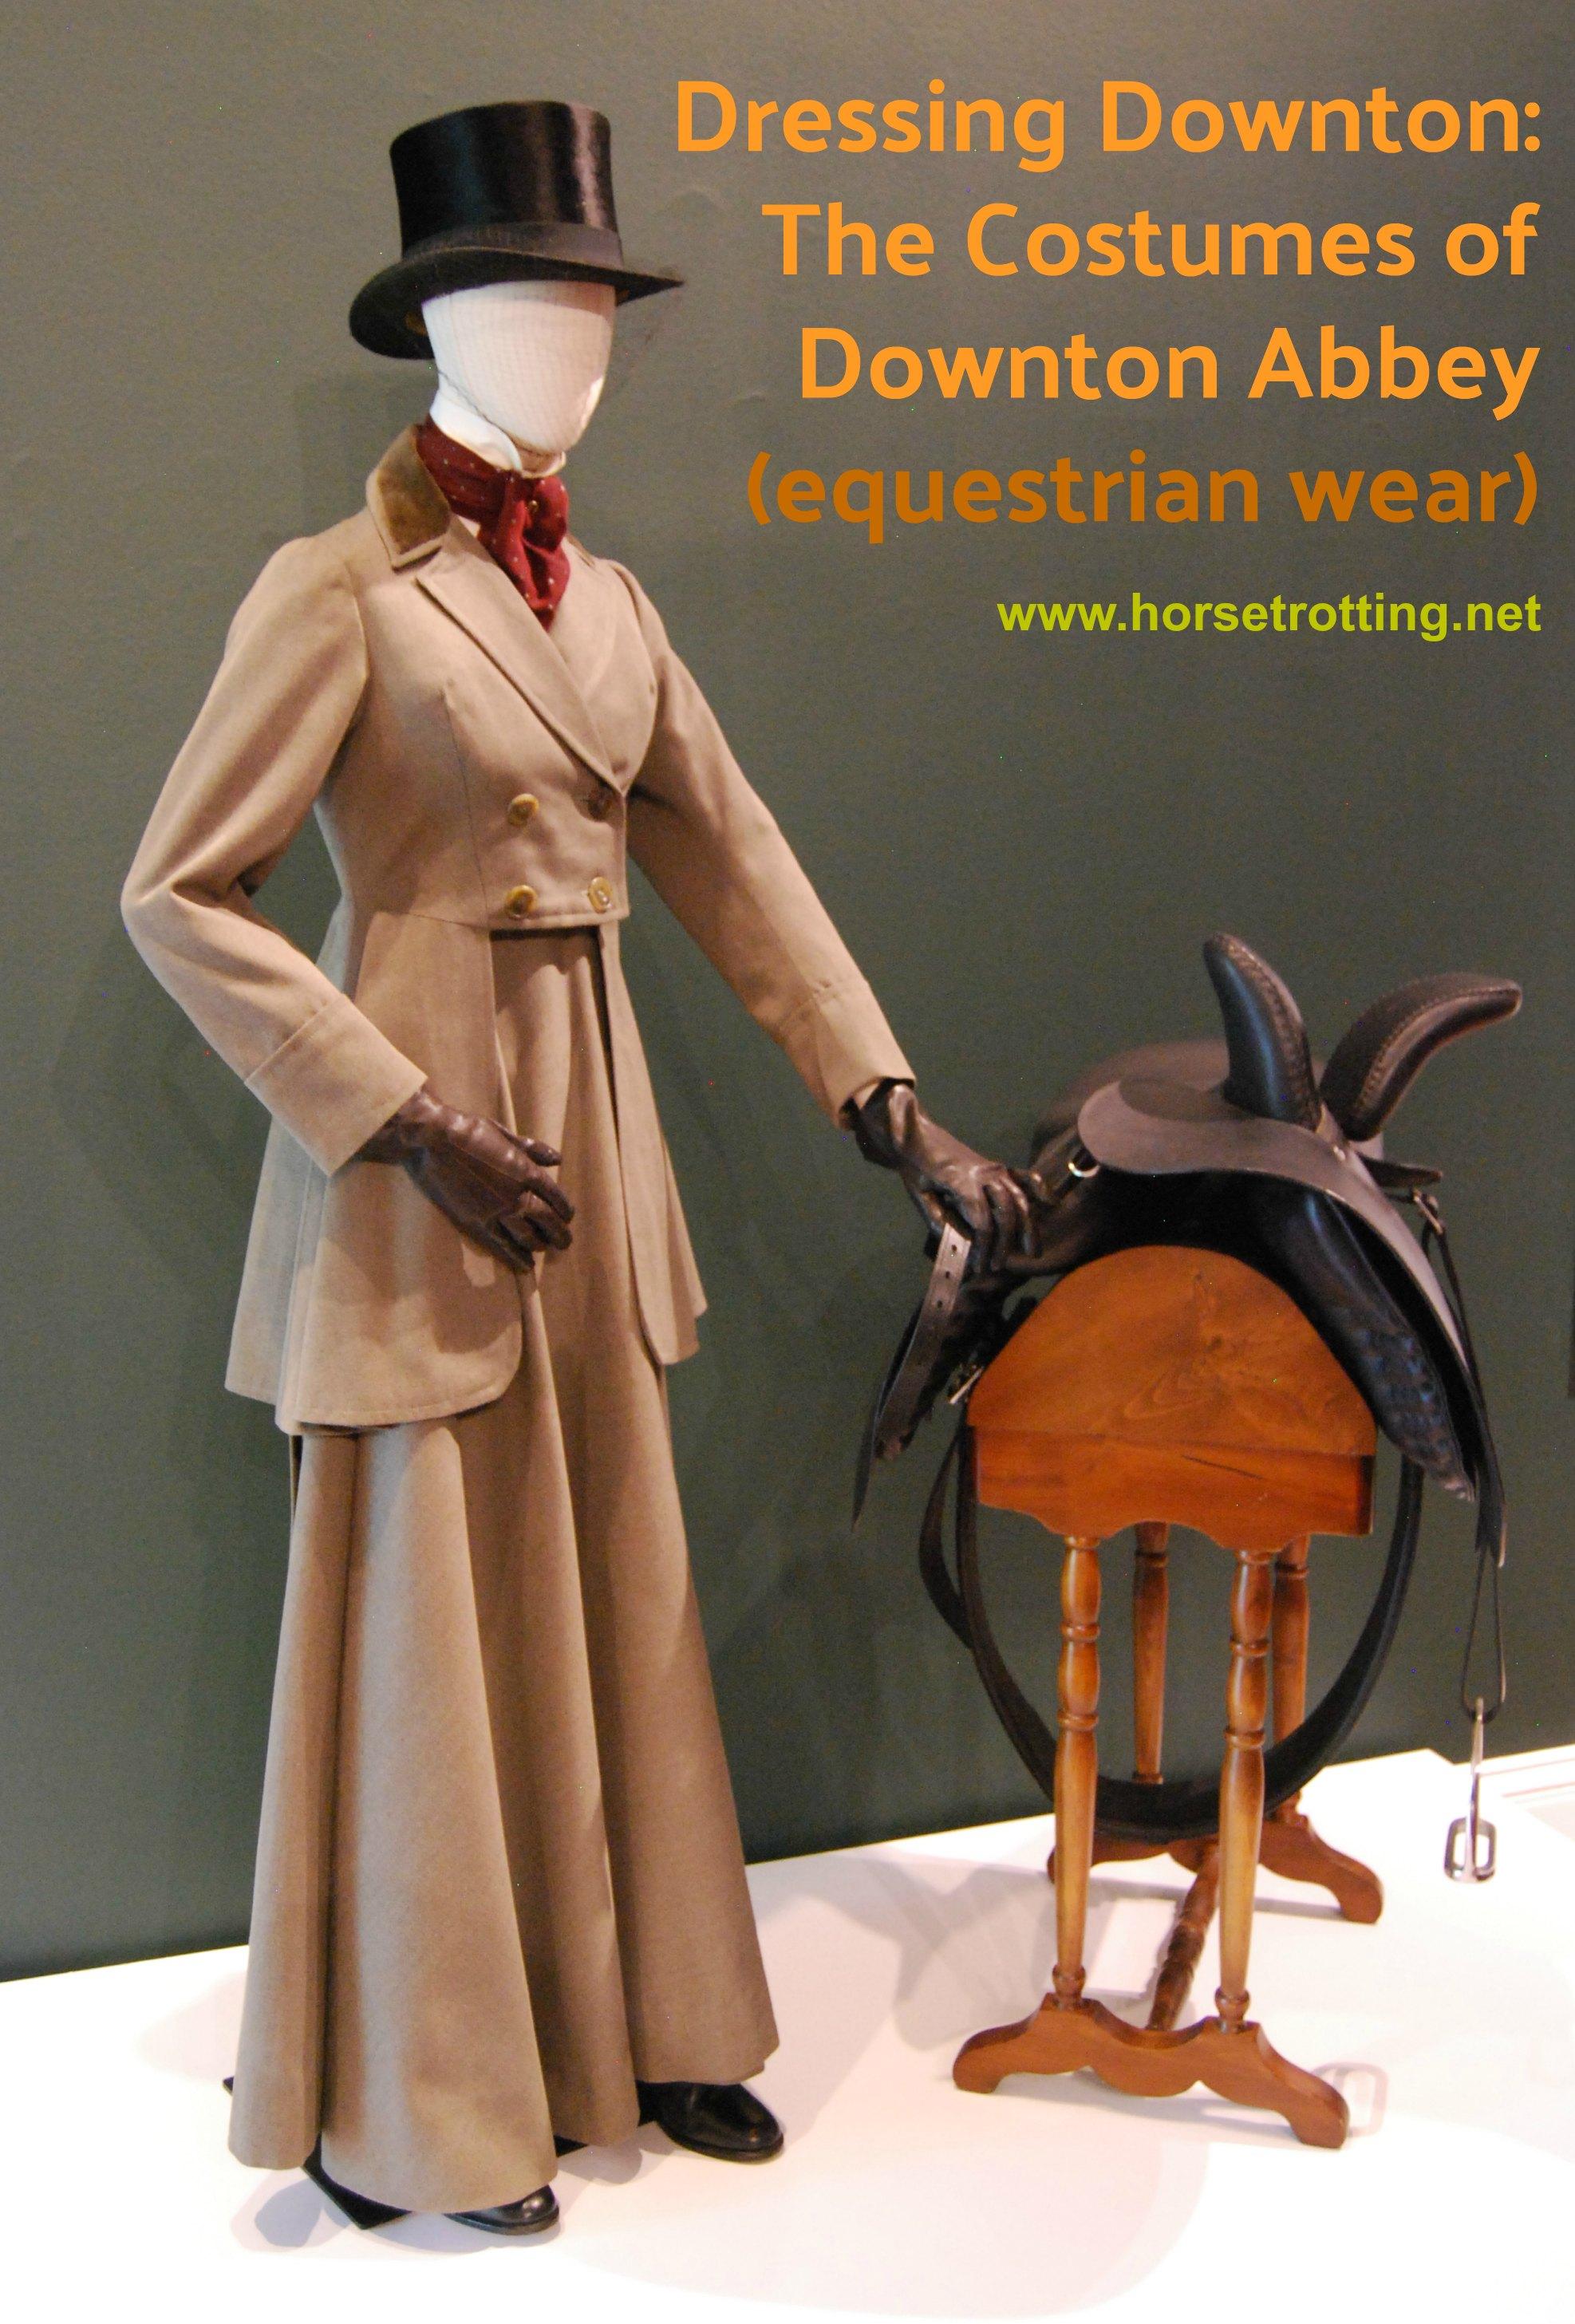 Downton Abbey Equine Costume horsetrotting.net